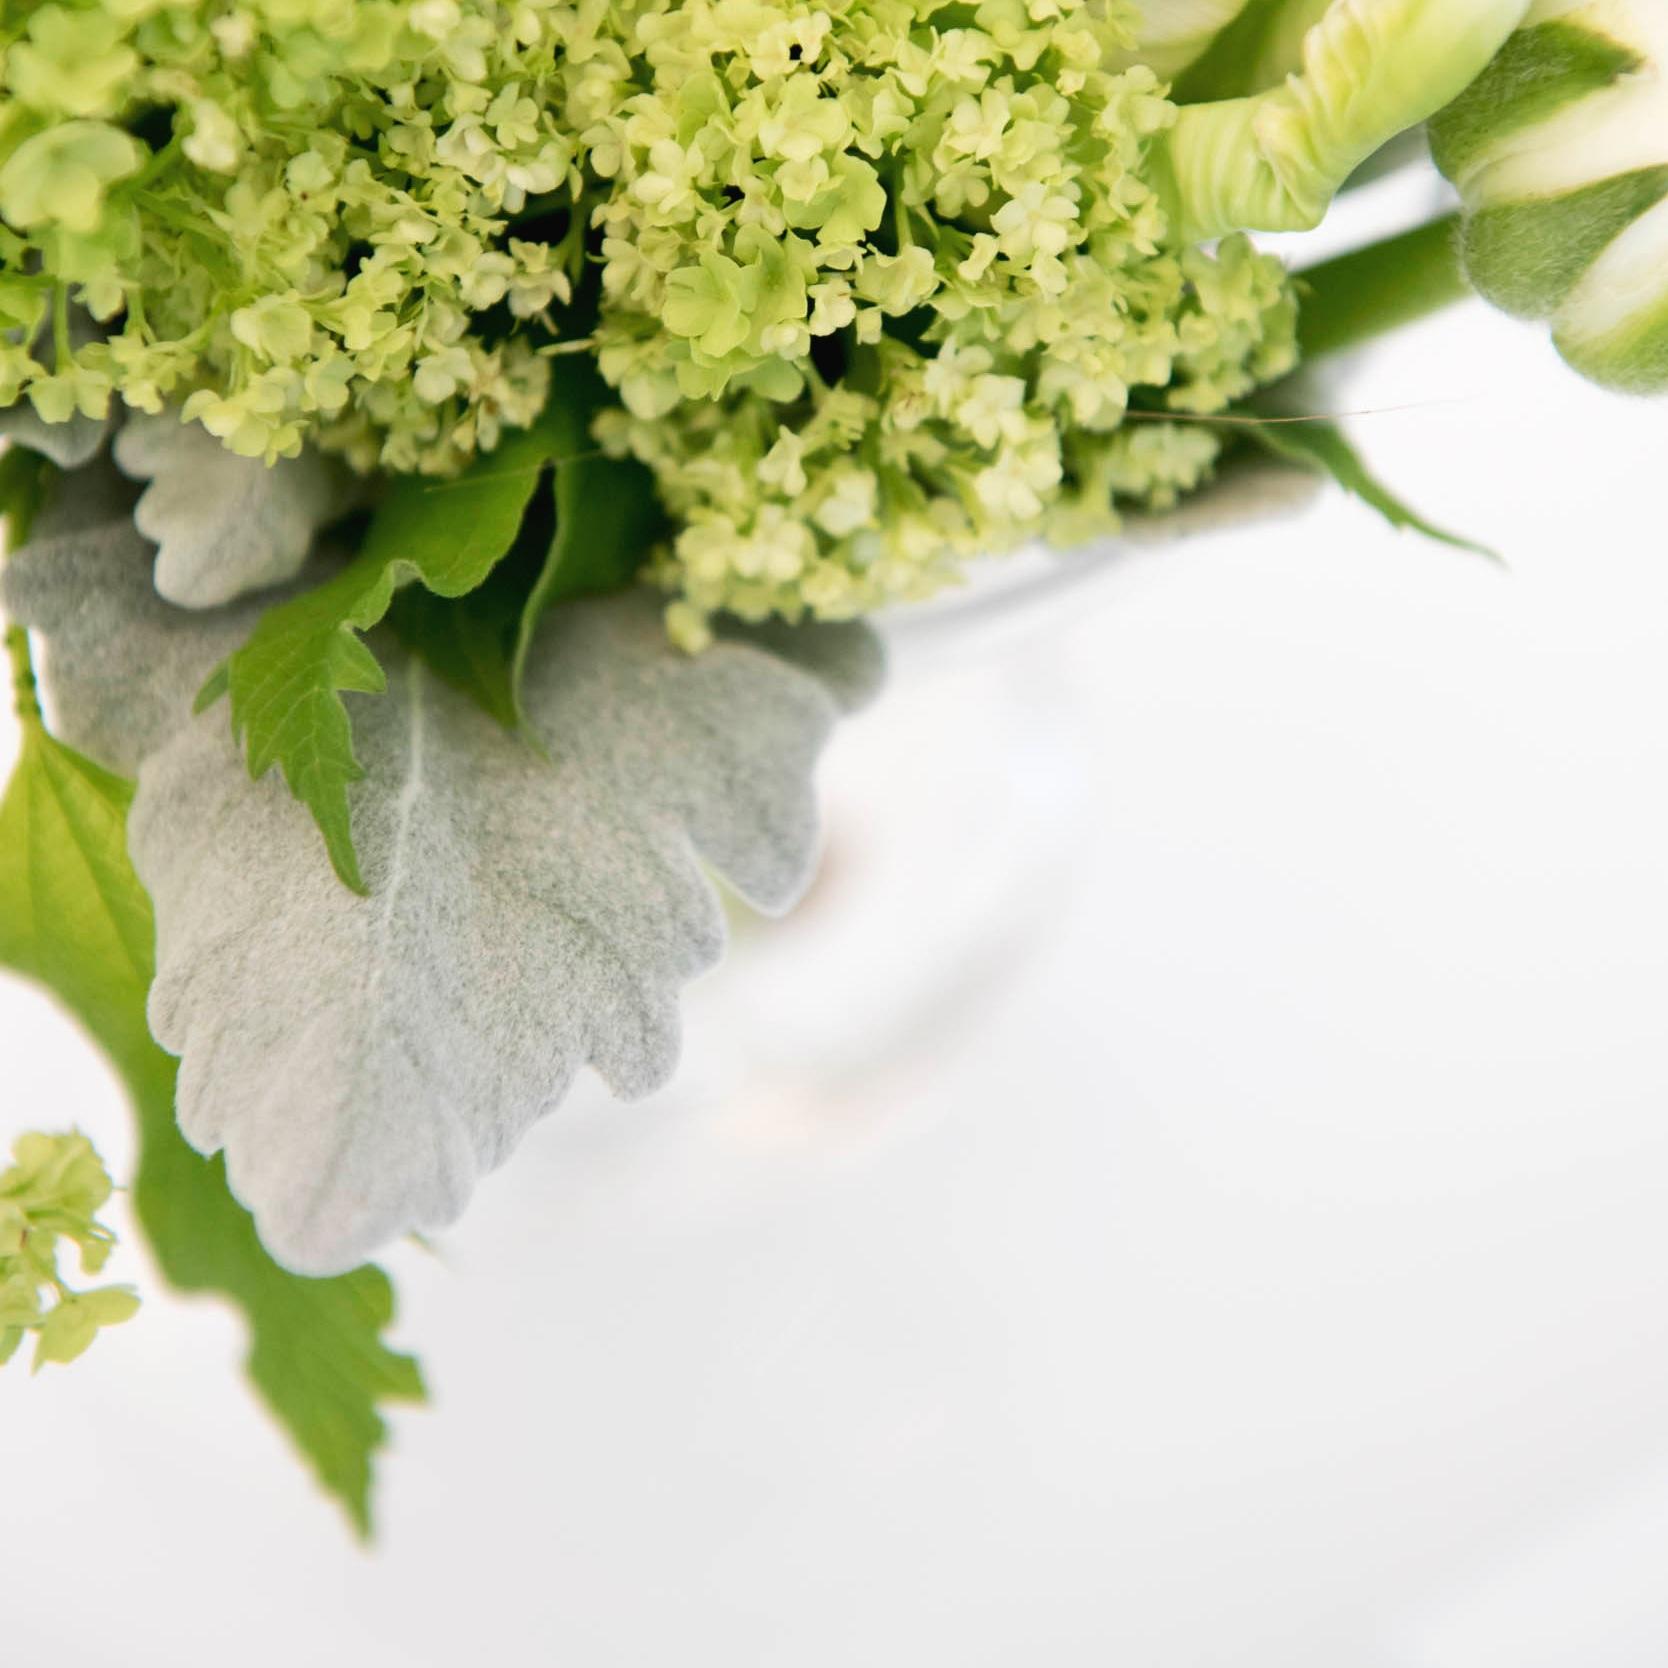 lilacs-florals-wedding-florist-%C2%A9aliciapetittiphotography-143.jpg